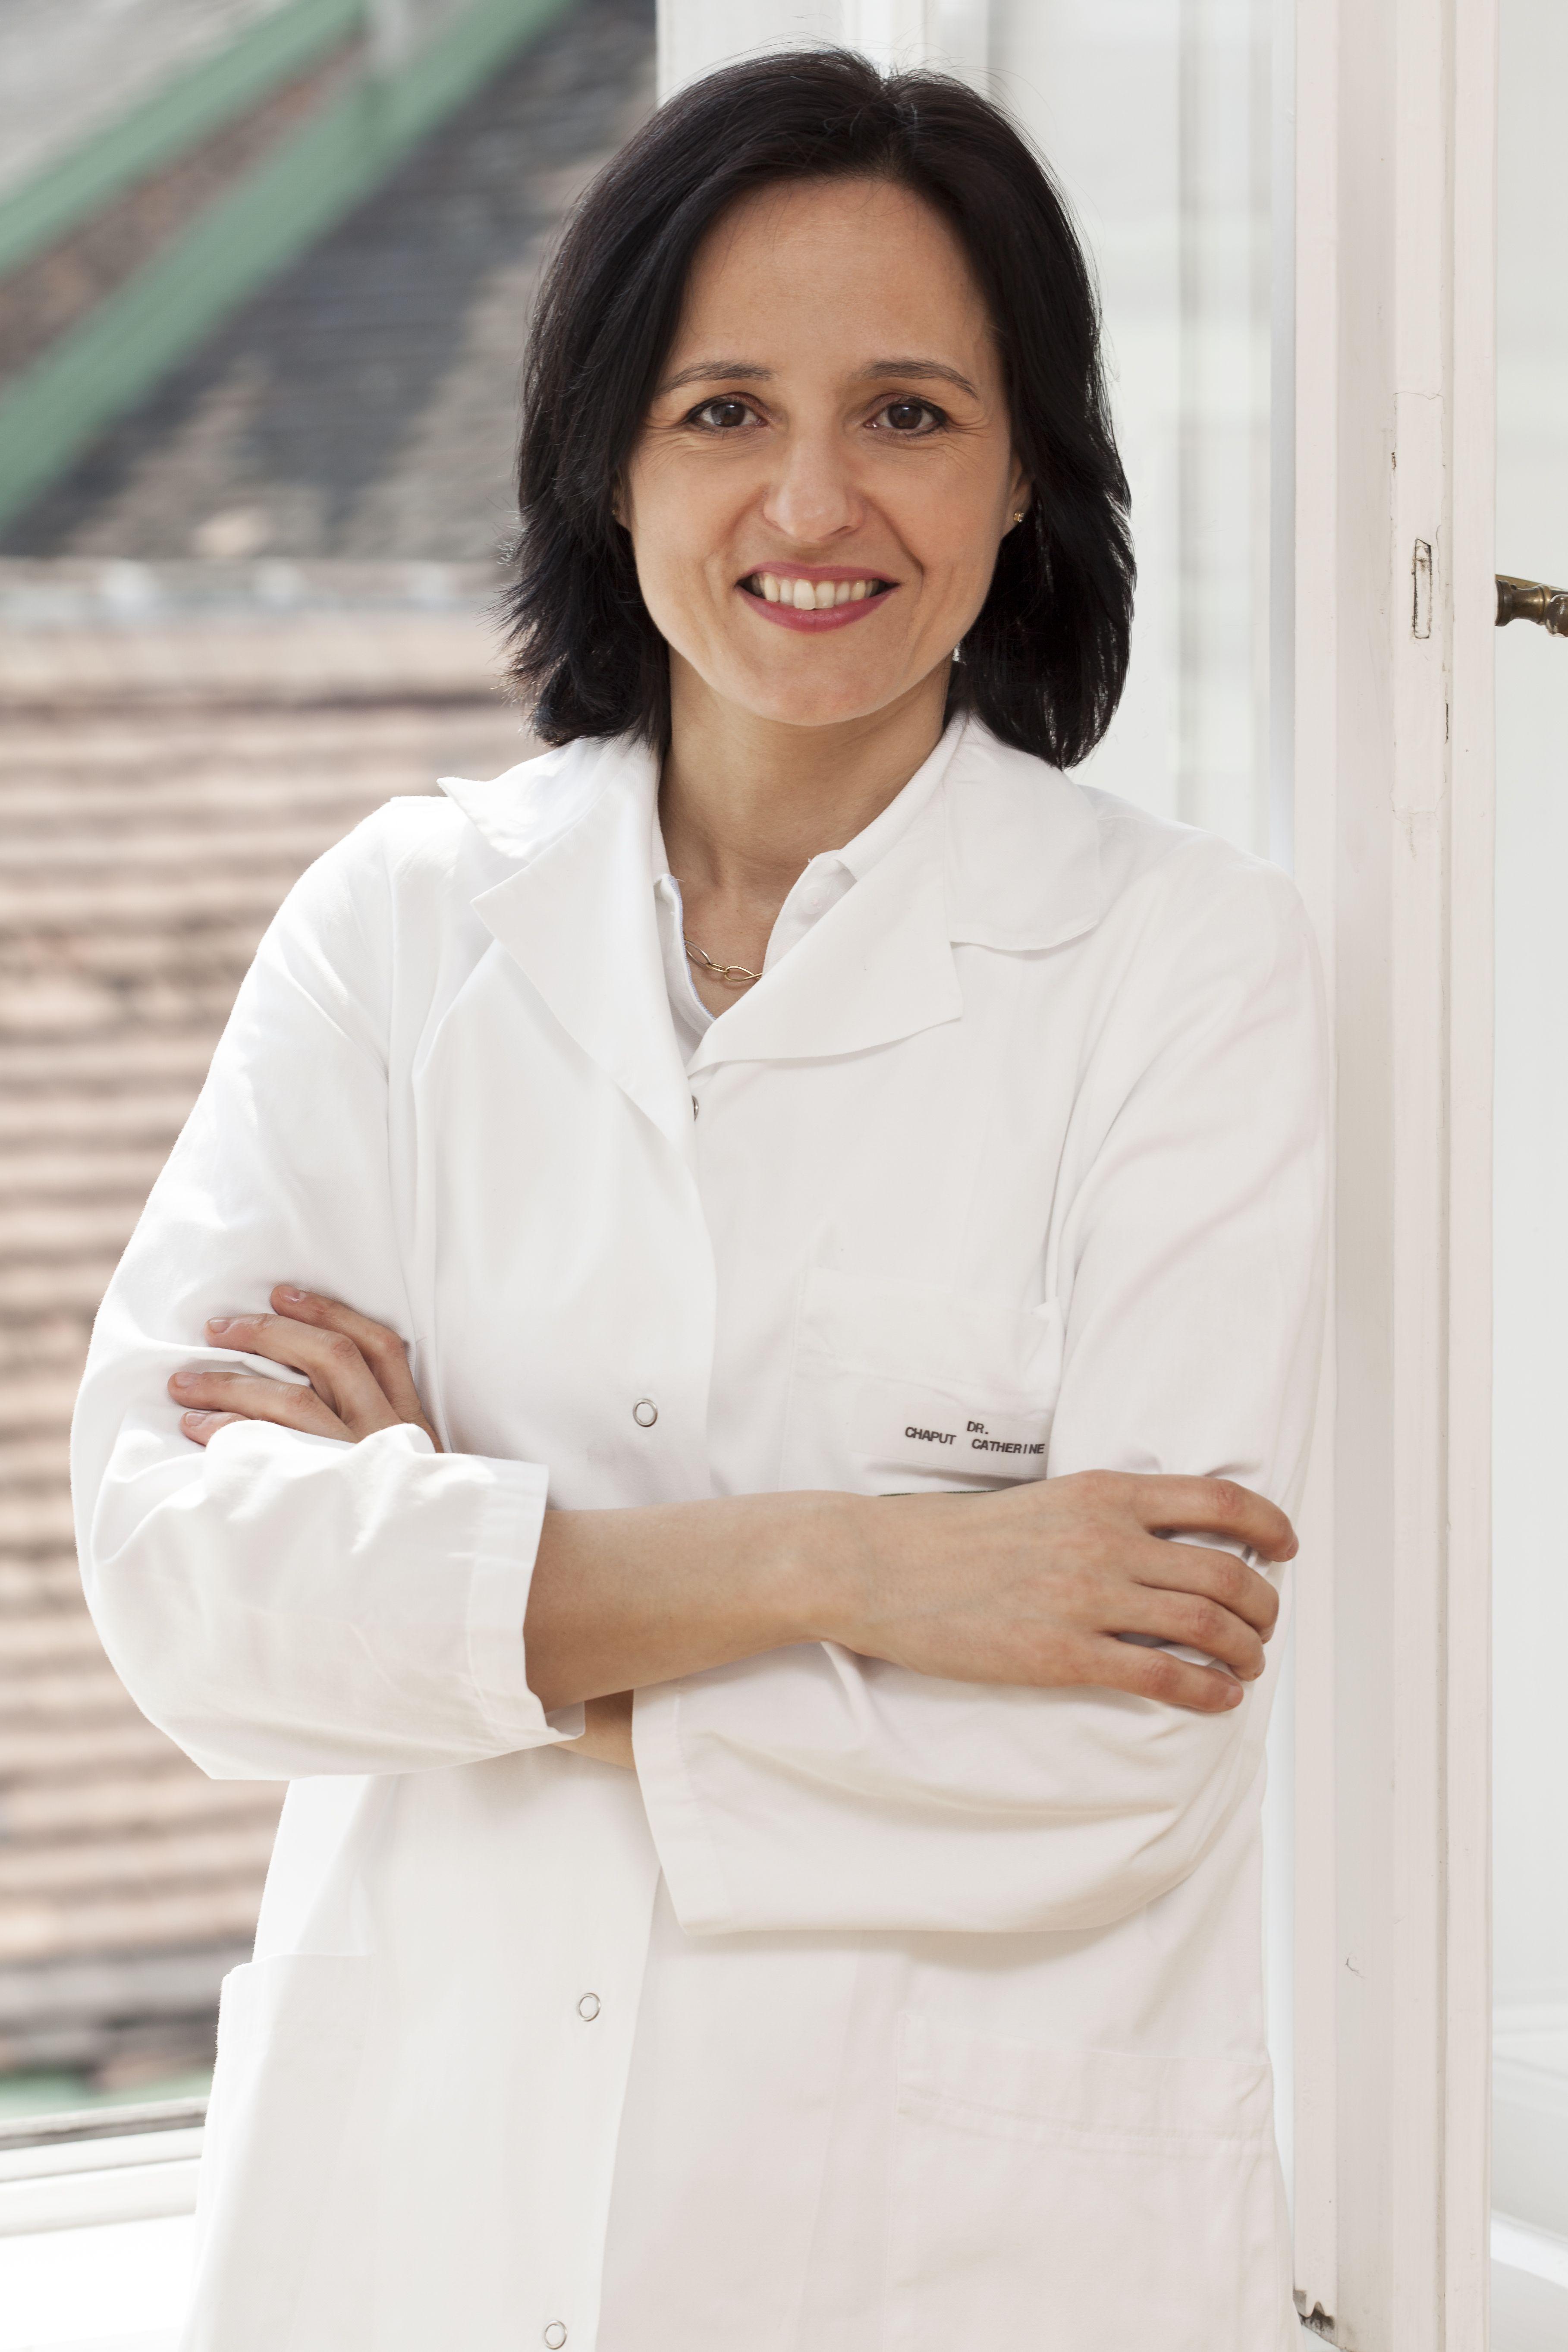 Dr. Catherine Chaput